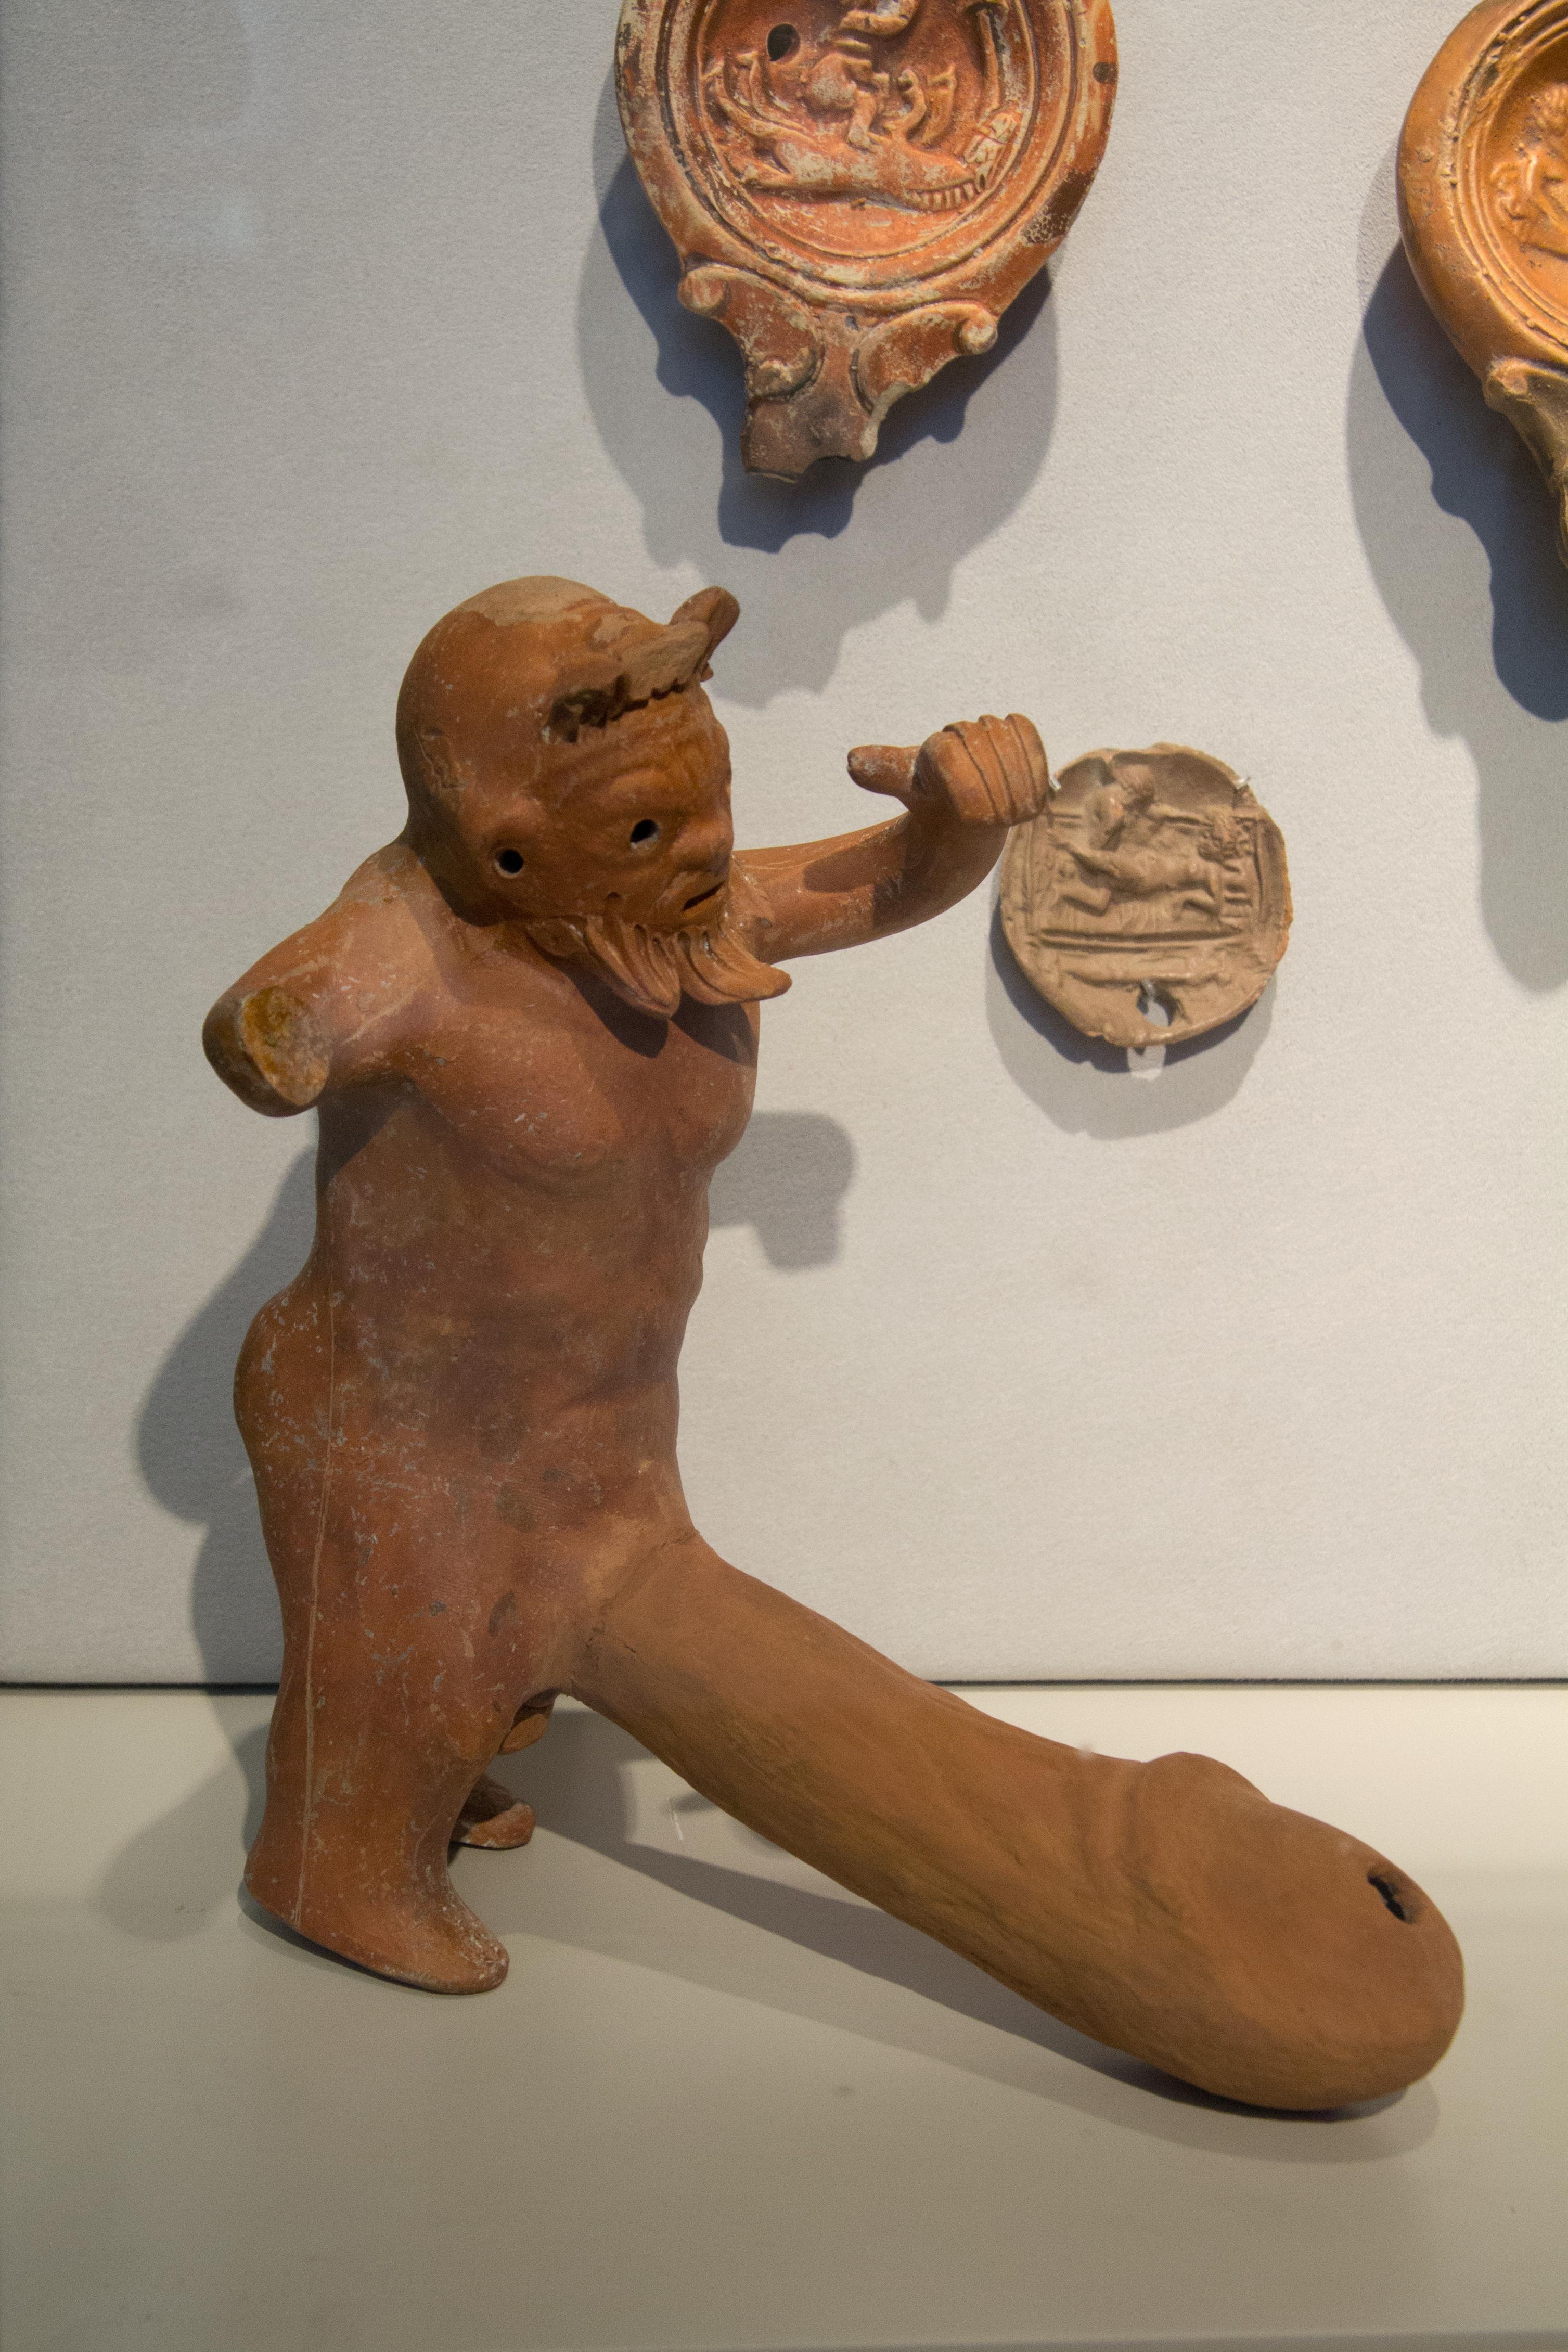 Ithyphallic_Satyr%2C_terracotta%2C_Antikensammlung_Berlin%2C_141774.jpg